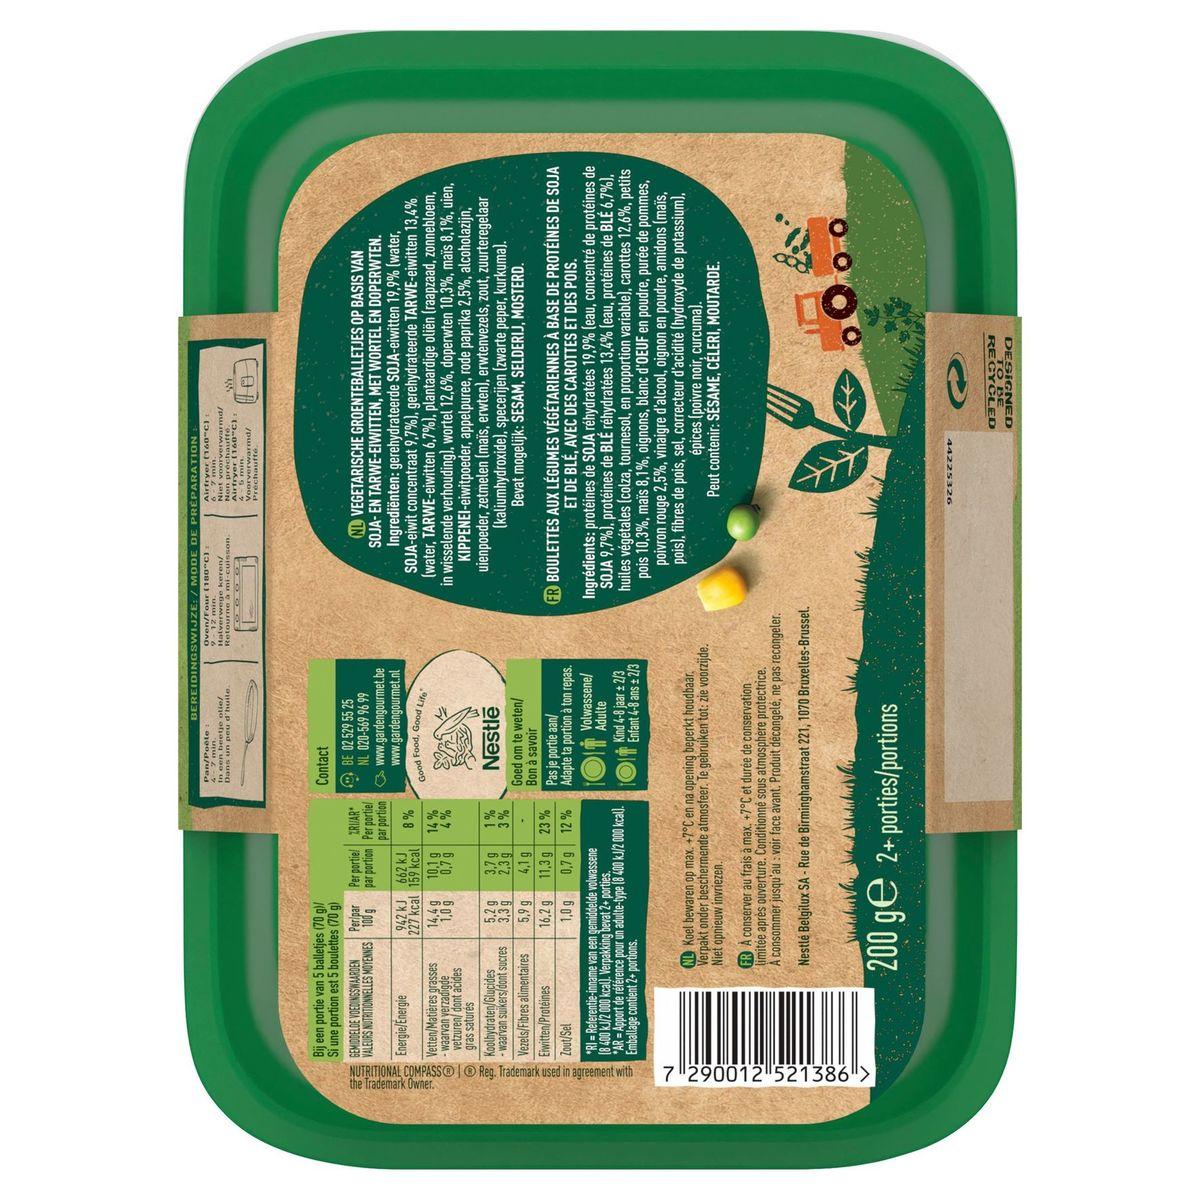 GARDEN GOURMET Vegetarische Groenteballetjes x14 200 g